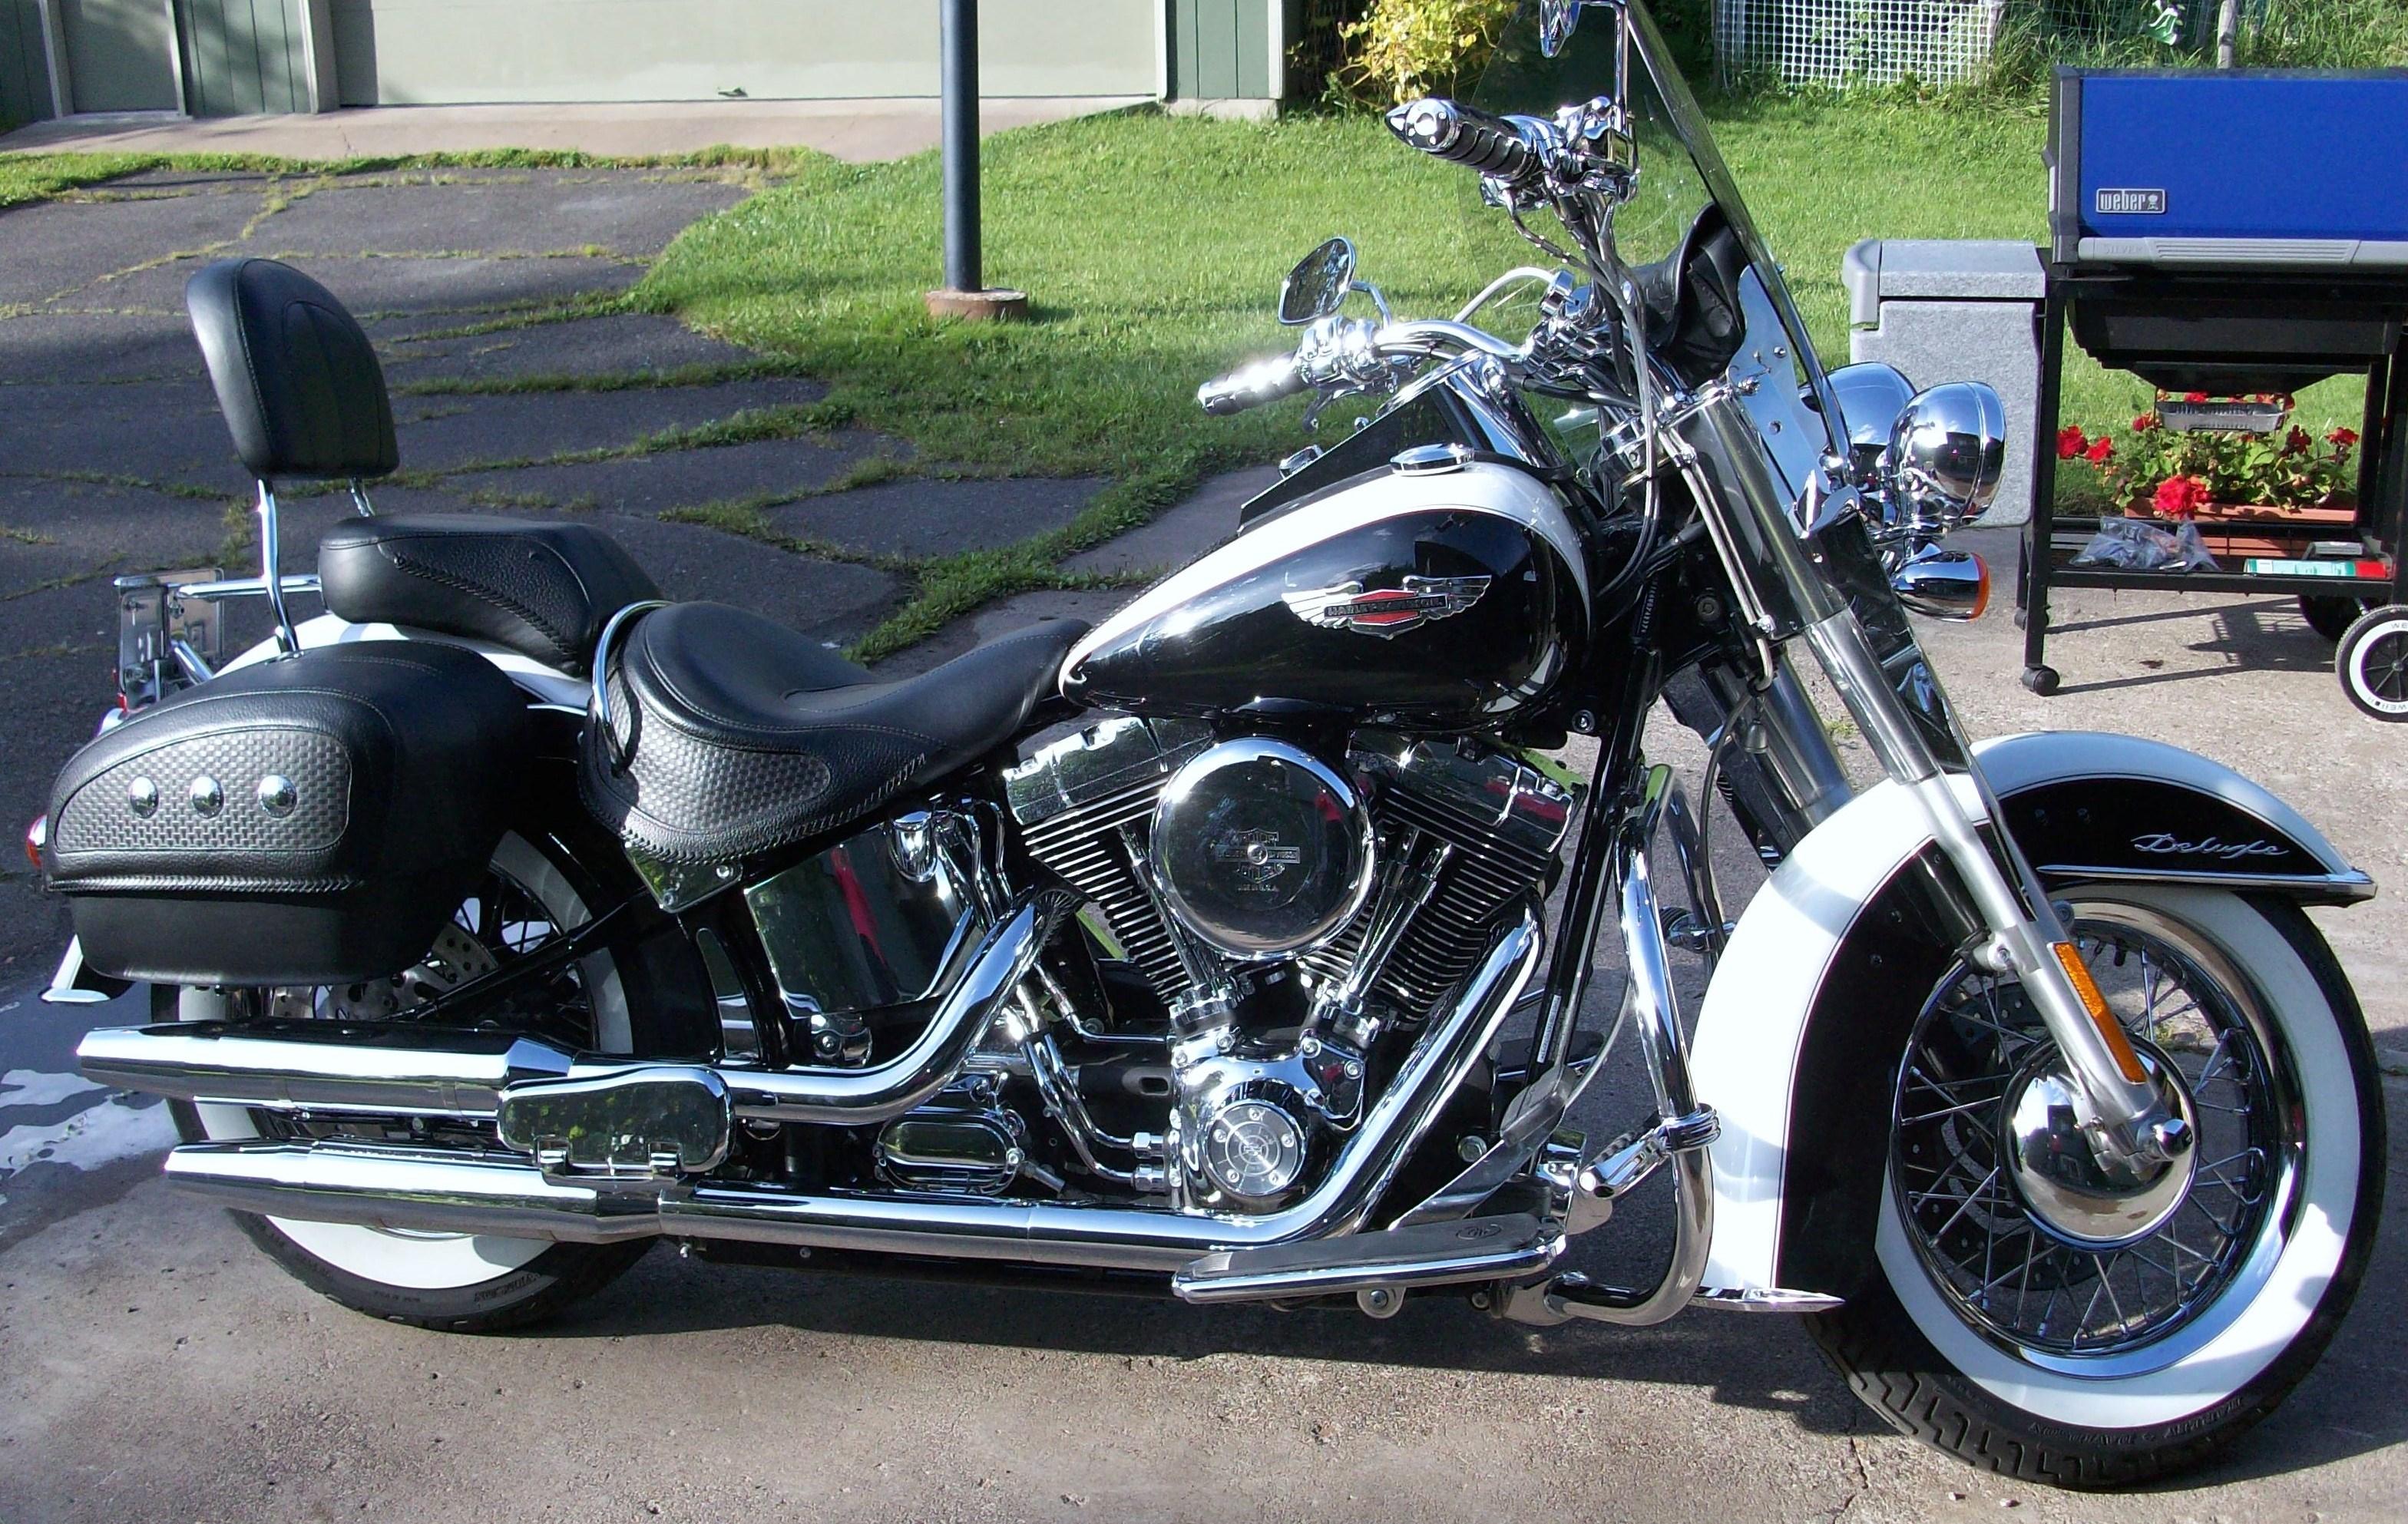 2005 Harley Davidson 174 Flstn I Softail 174 Deluxe Pearl White